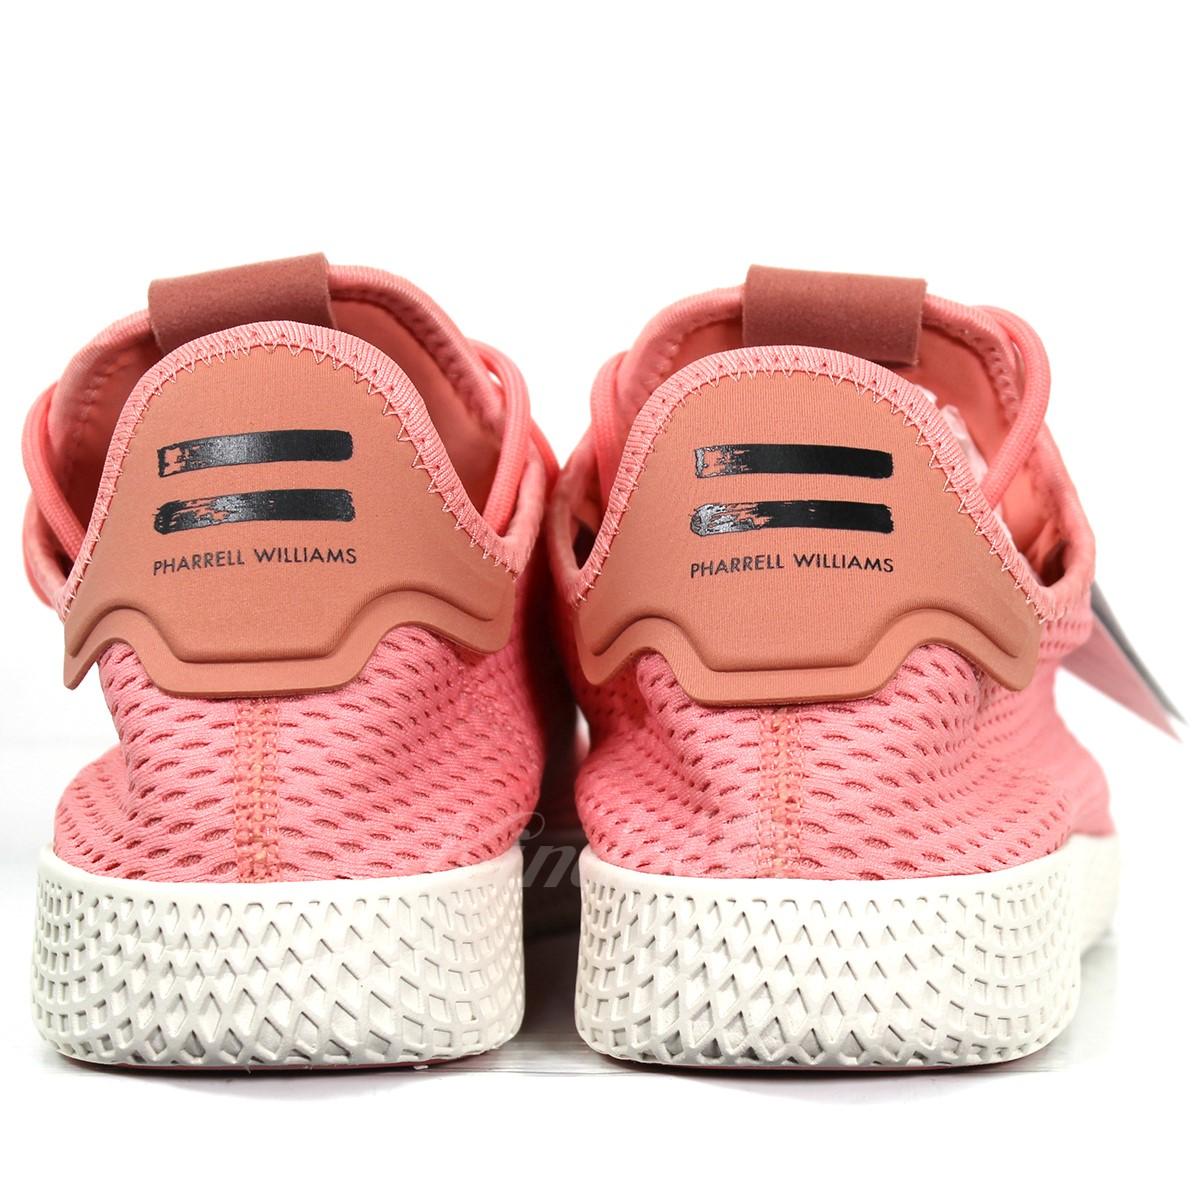 bf15d0bf5 adidas Originals PHARRELL WILLIAMS TENNIS HU PRIMEKNIT SHOES BY8715 pink  size  30cm (Adidas originals Farrell Williams)